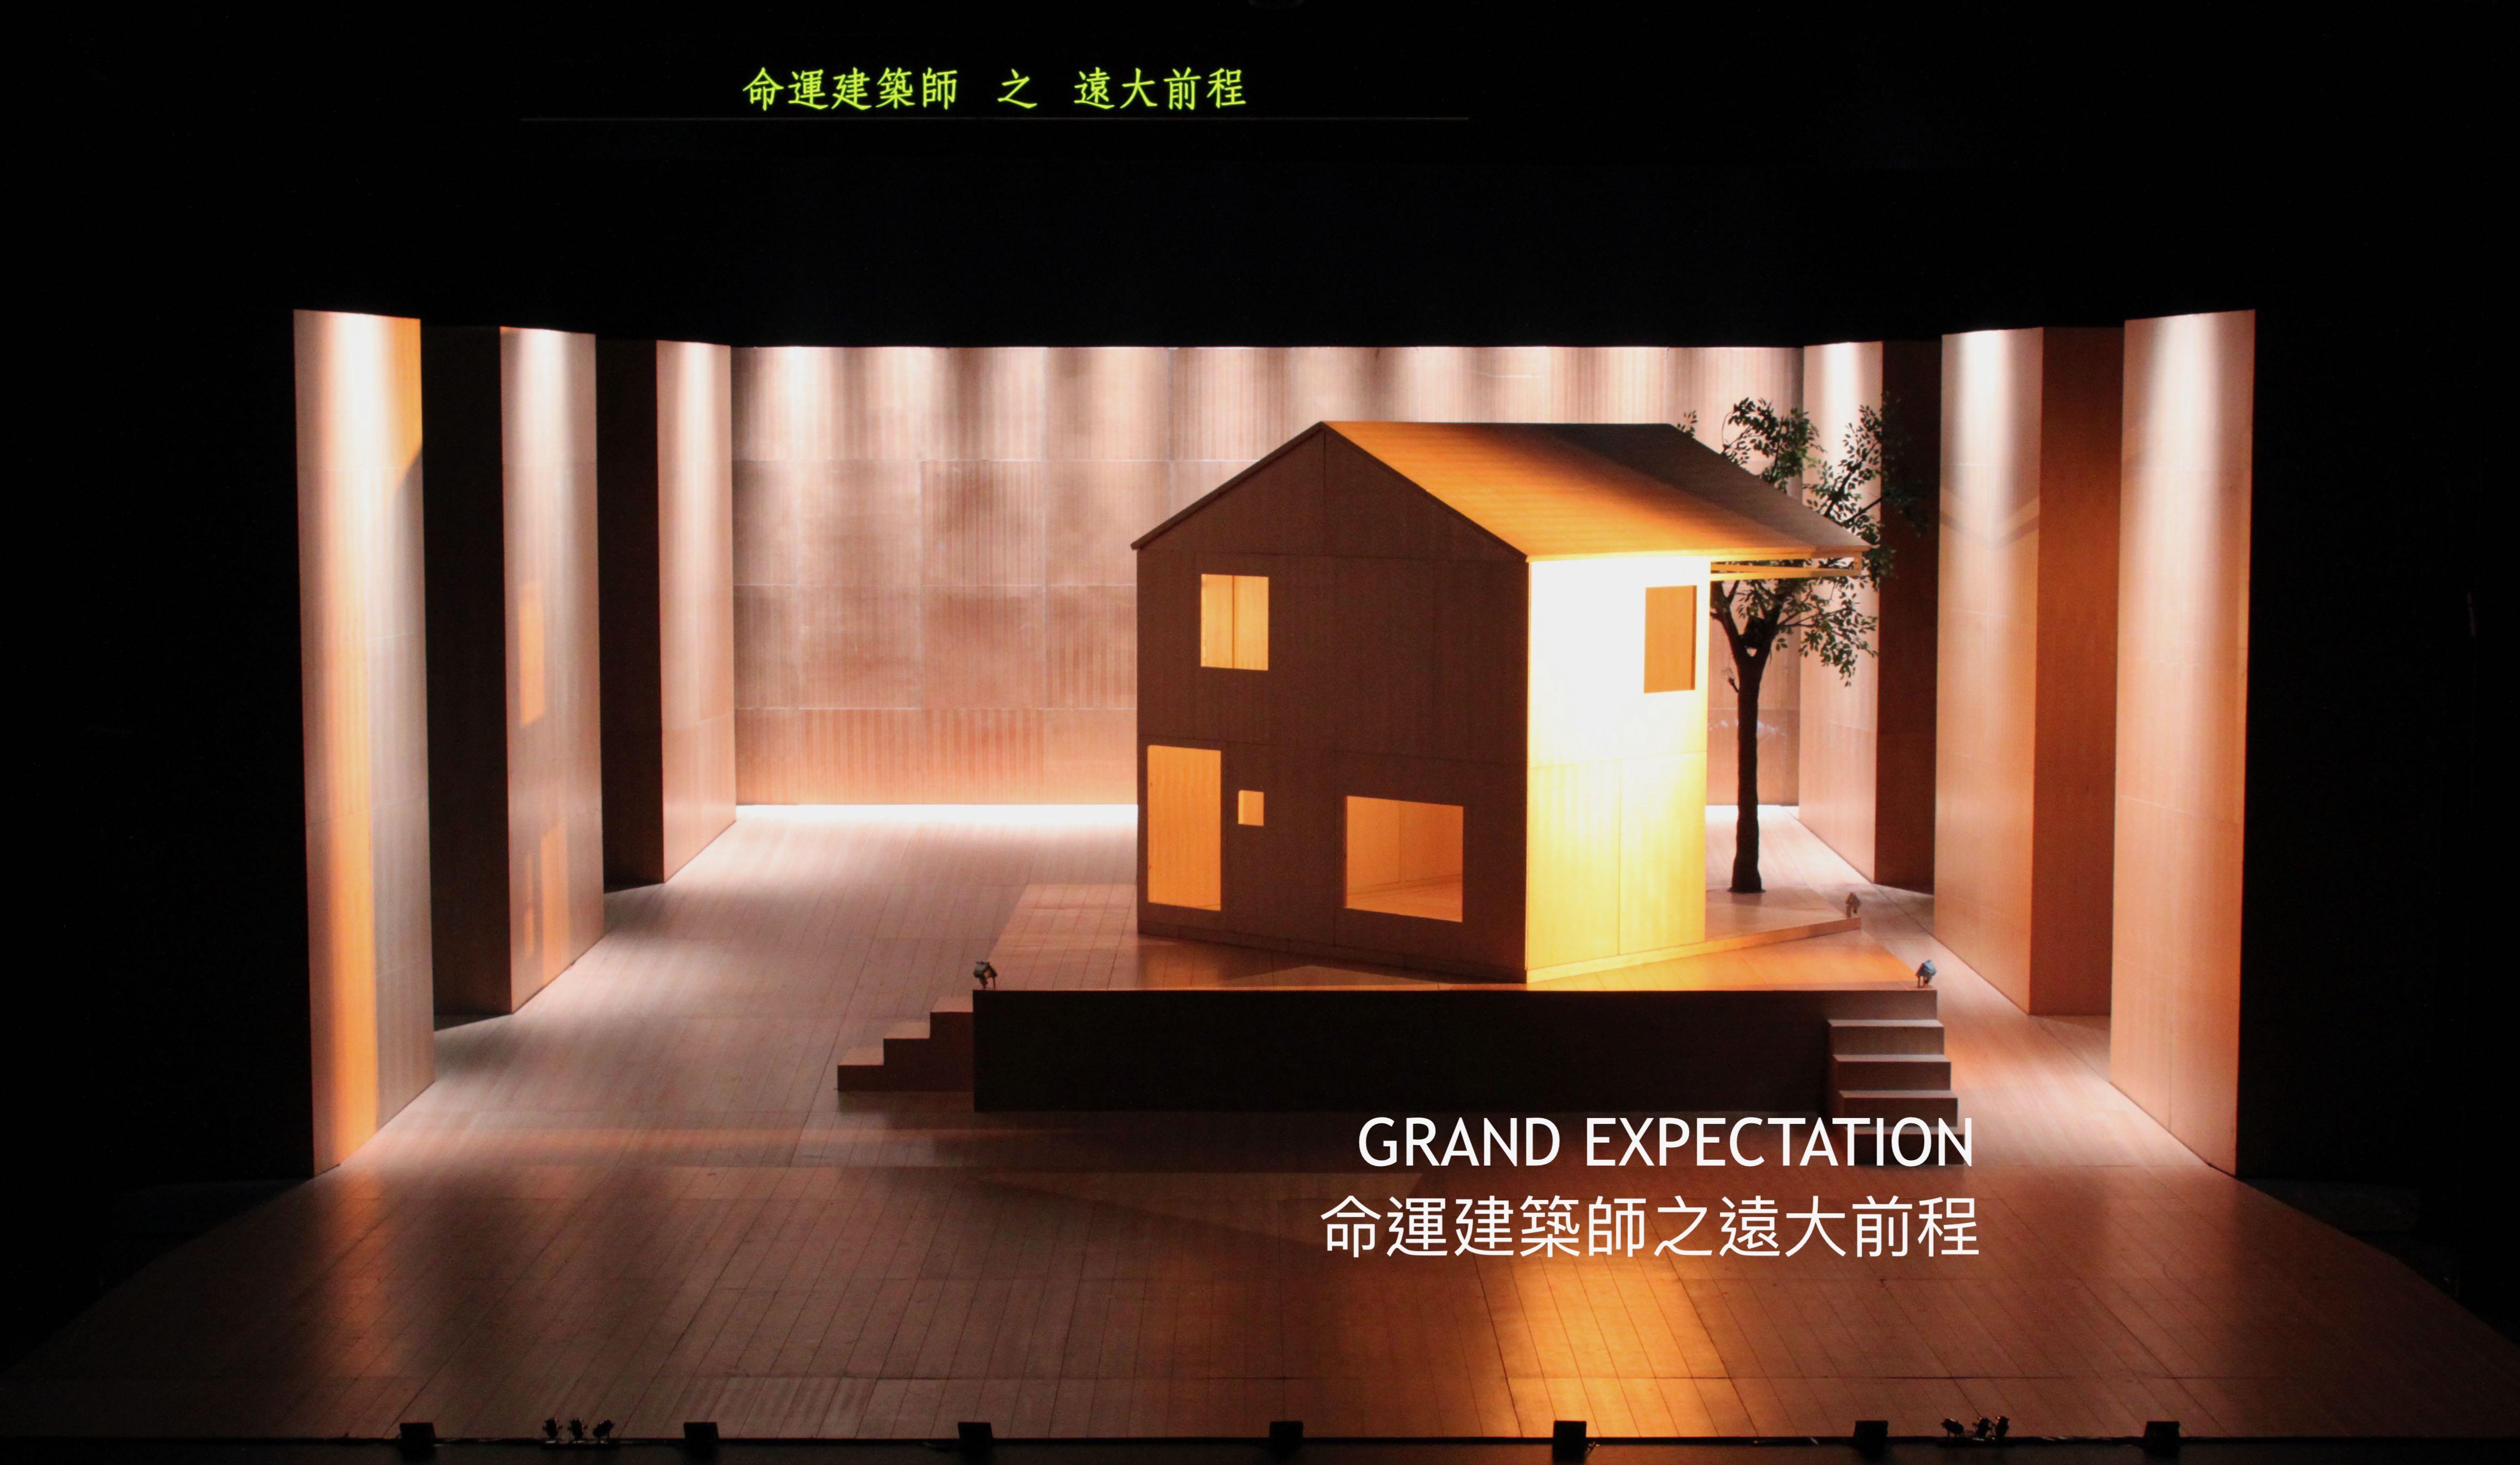 GEX_HK__0008 copy 2